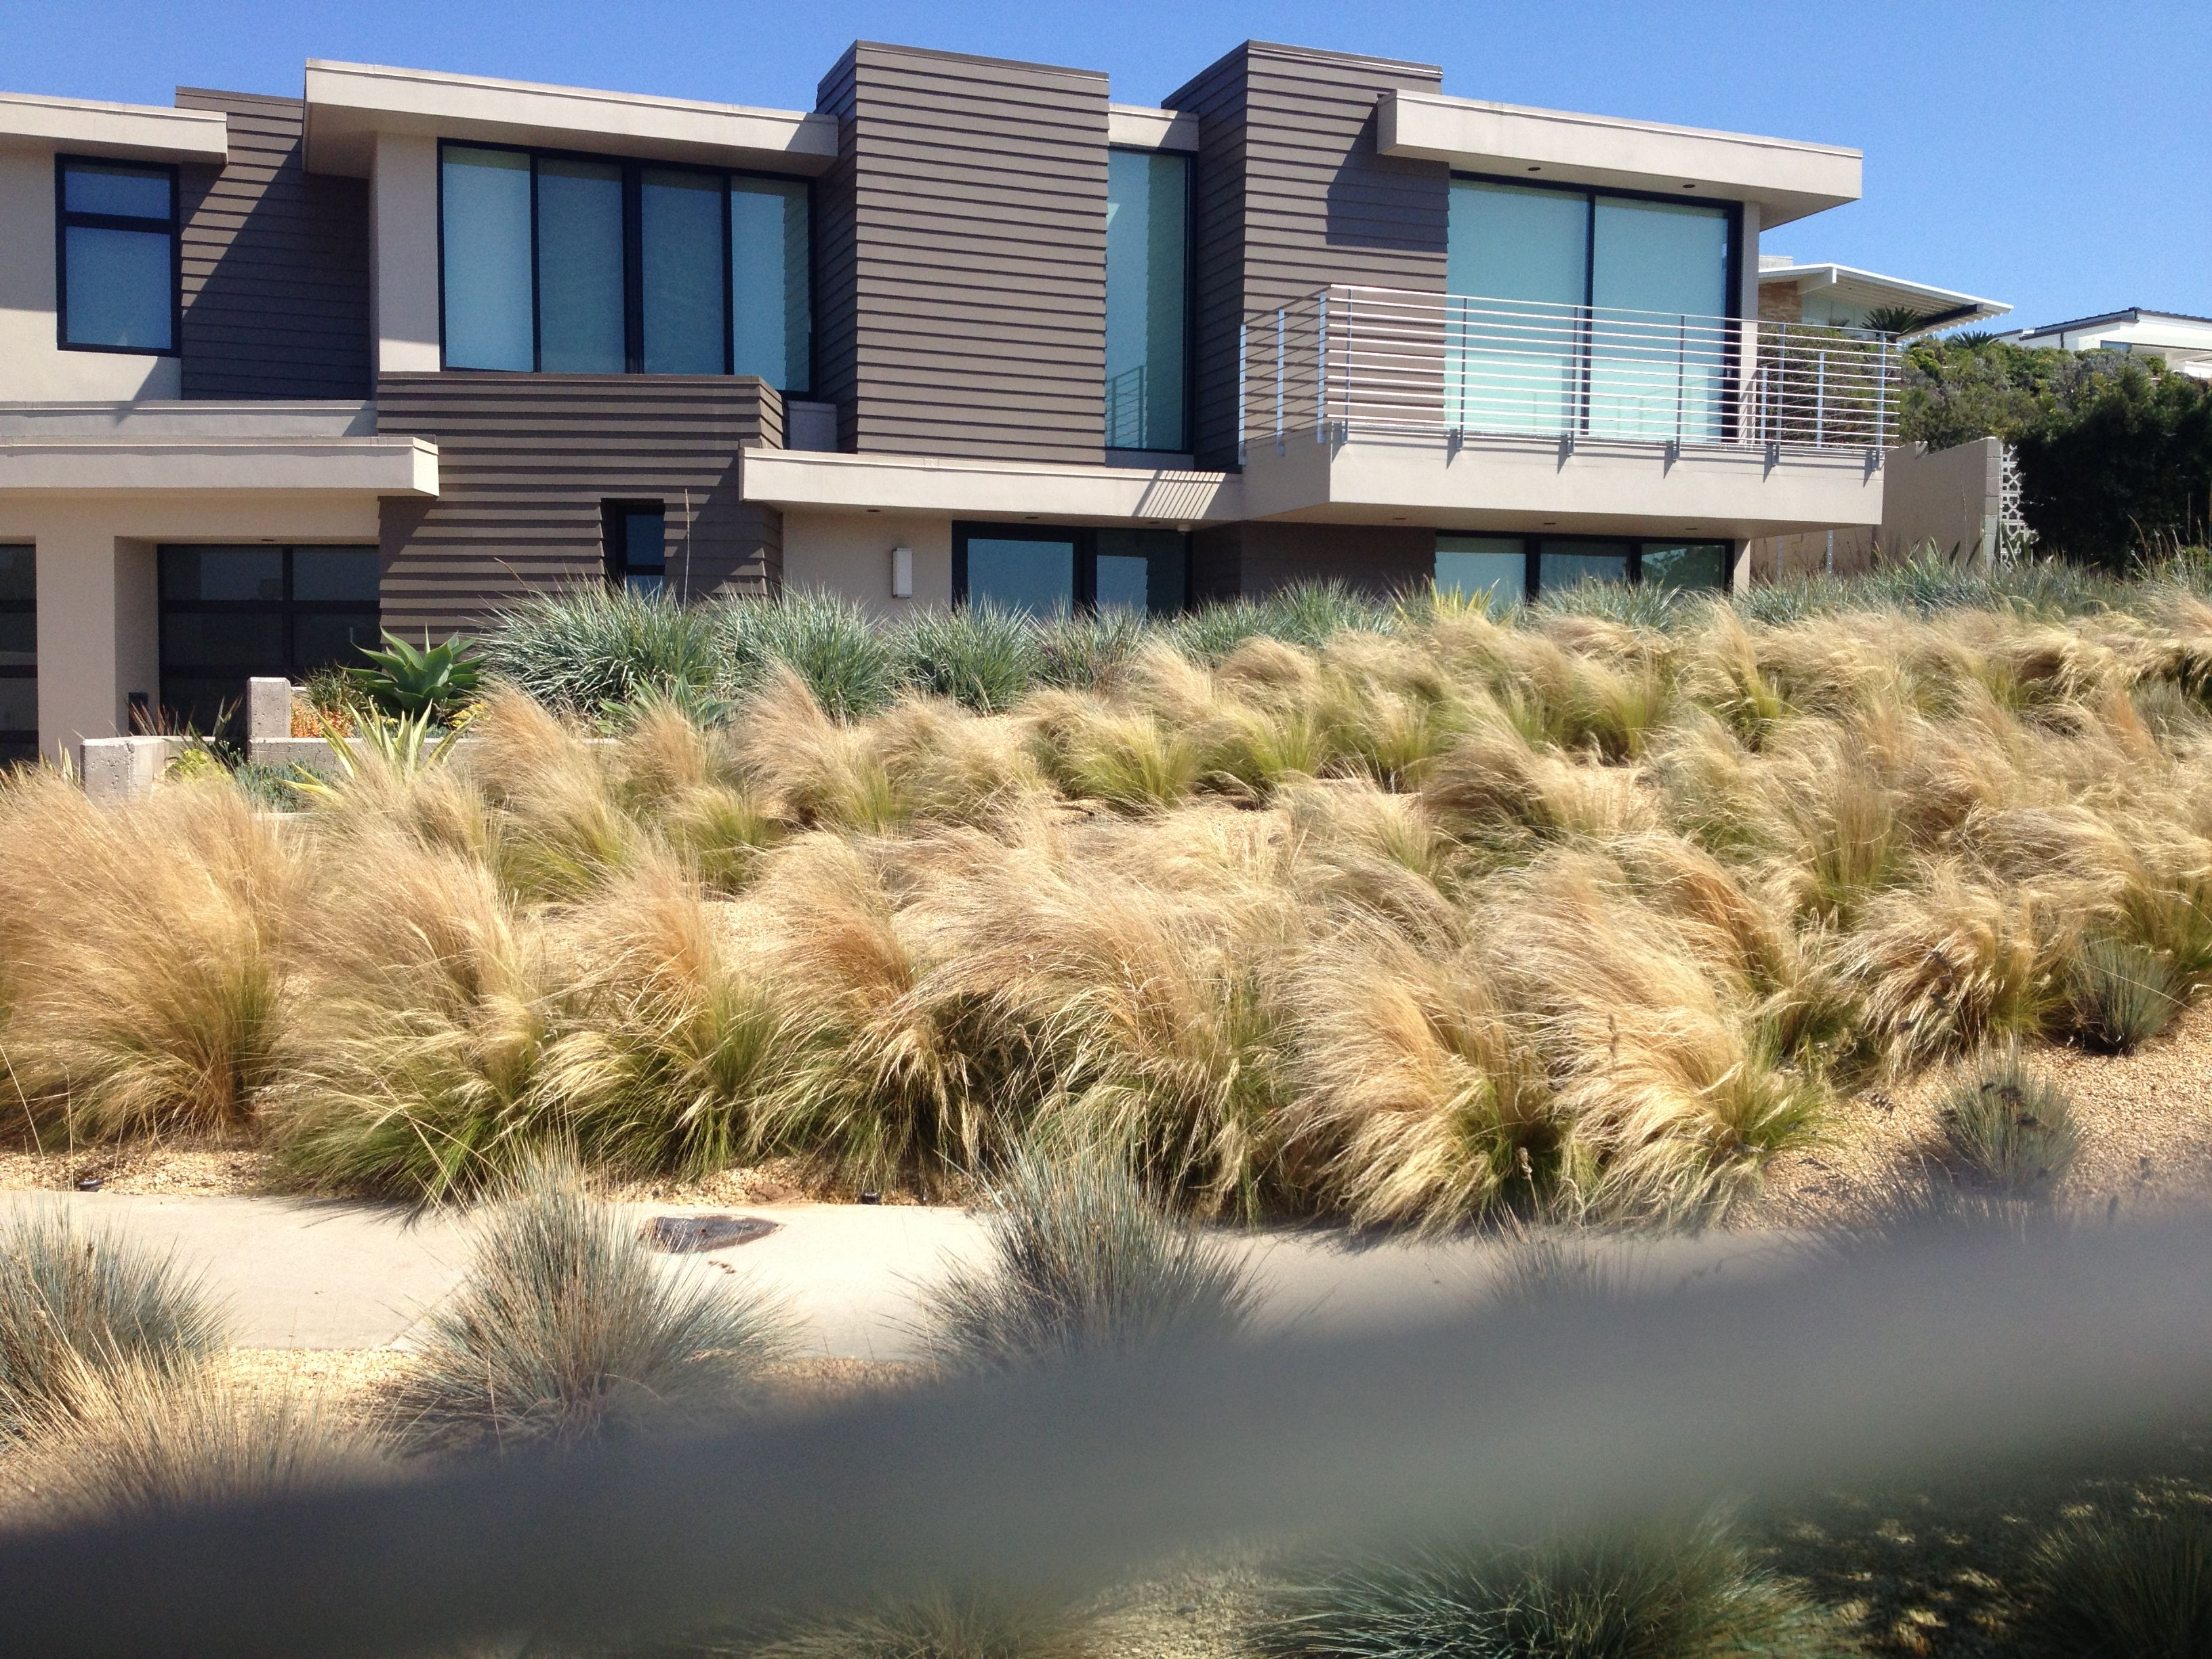 Landscaping grasses in mass alta vista landscaping pinterest